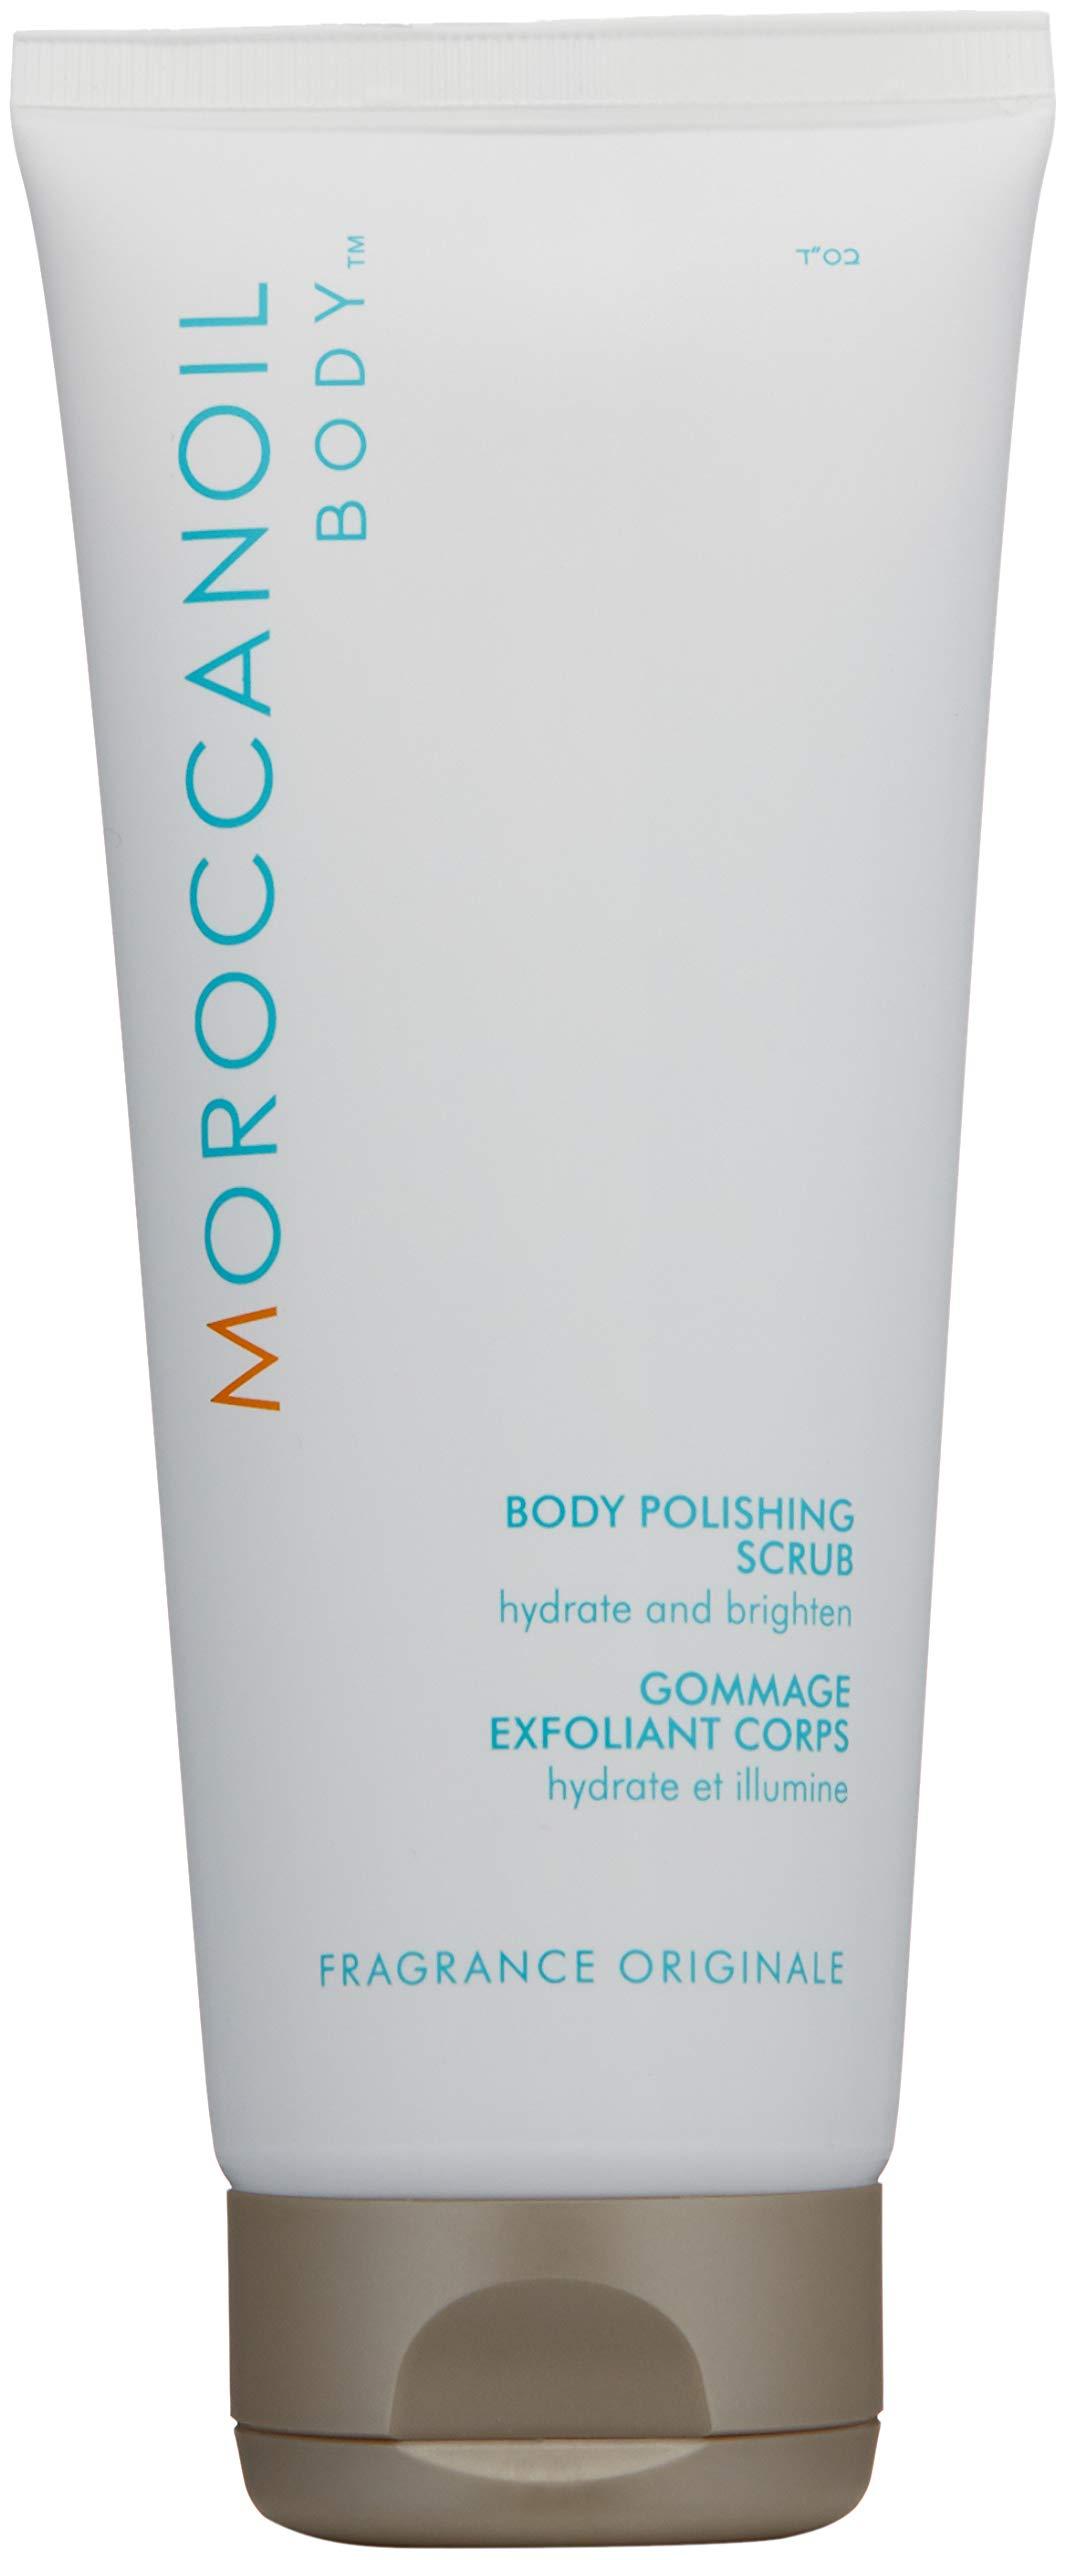 Moroccanoil Body Polishing Scrub, 6.7 Fl. Oz. by MOROCCANOIL